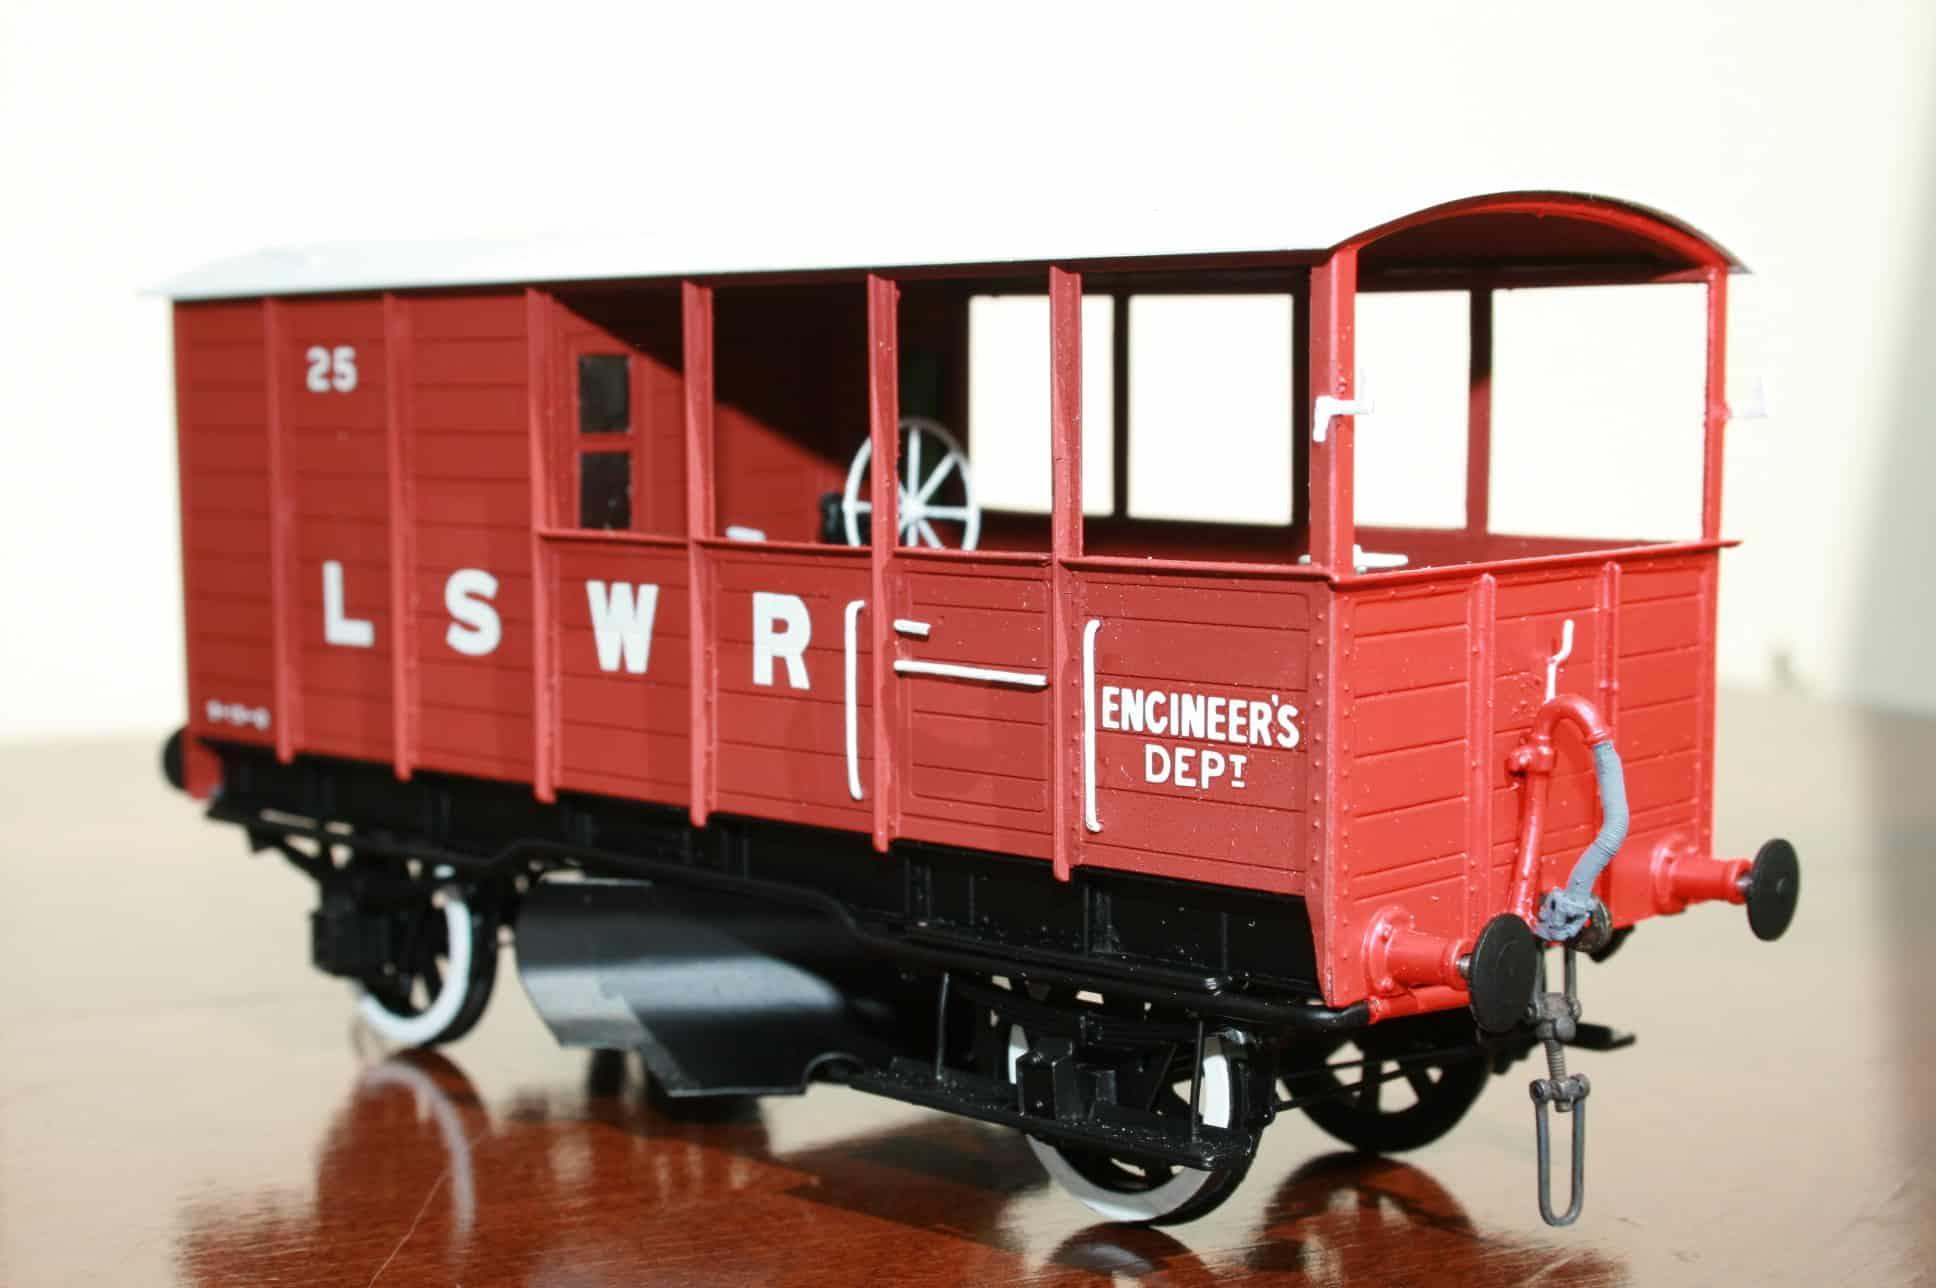 LSWR Engineer's Dept. Ballast Plough Brake Van r/n 25